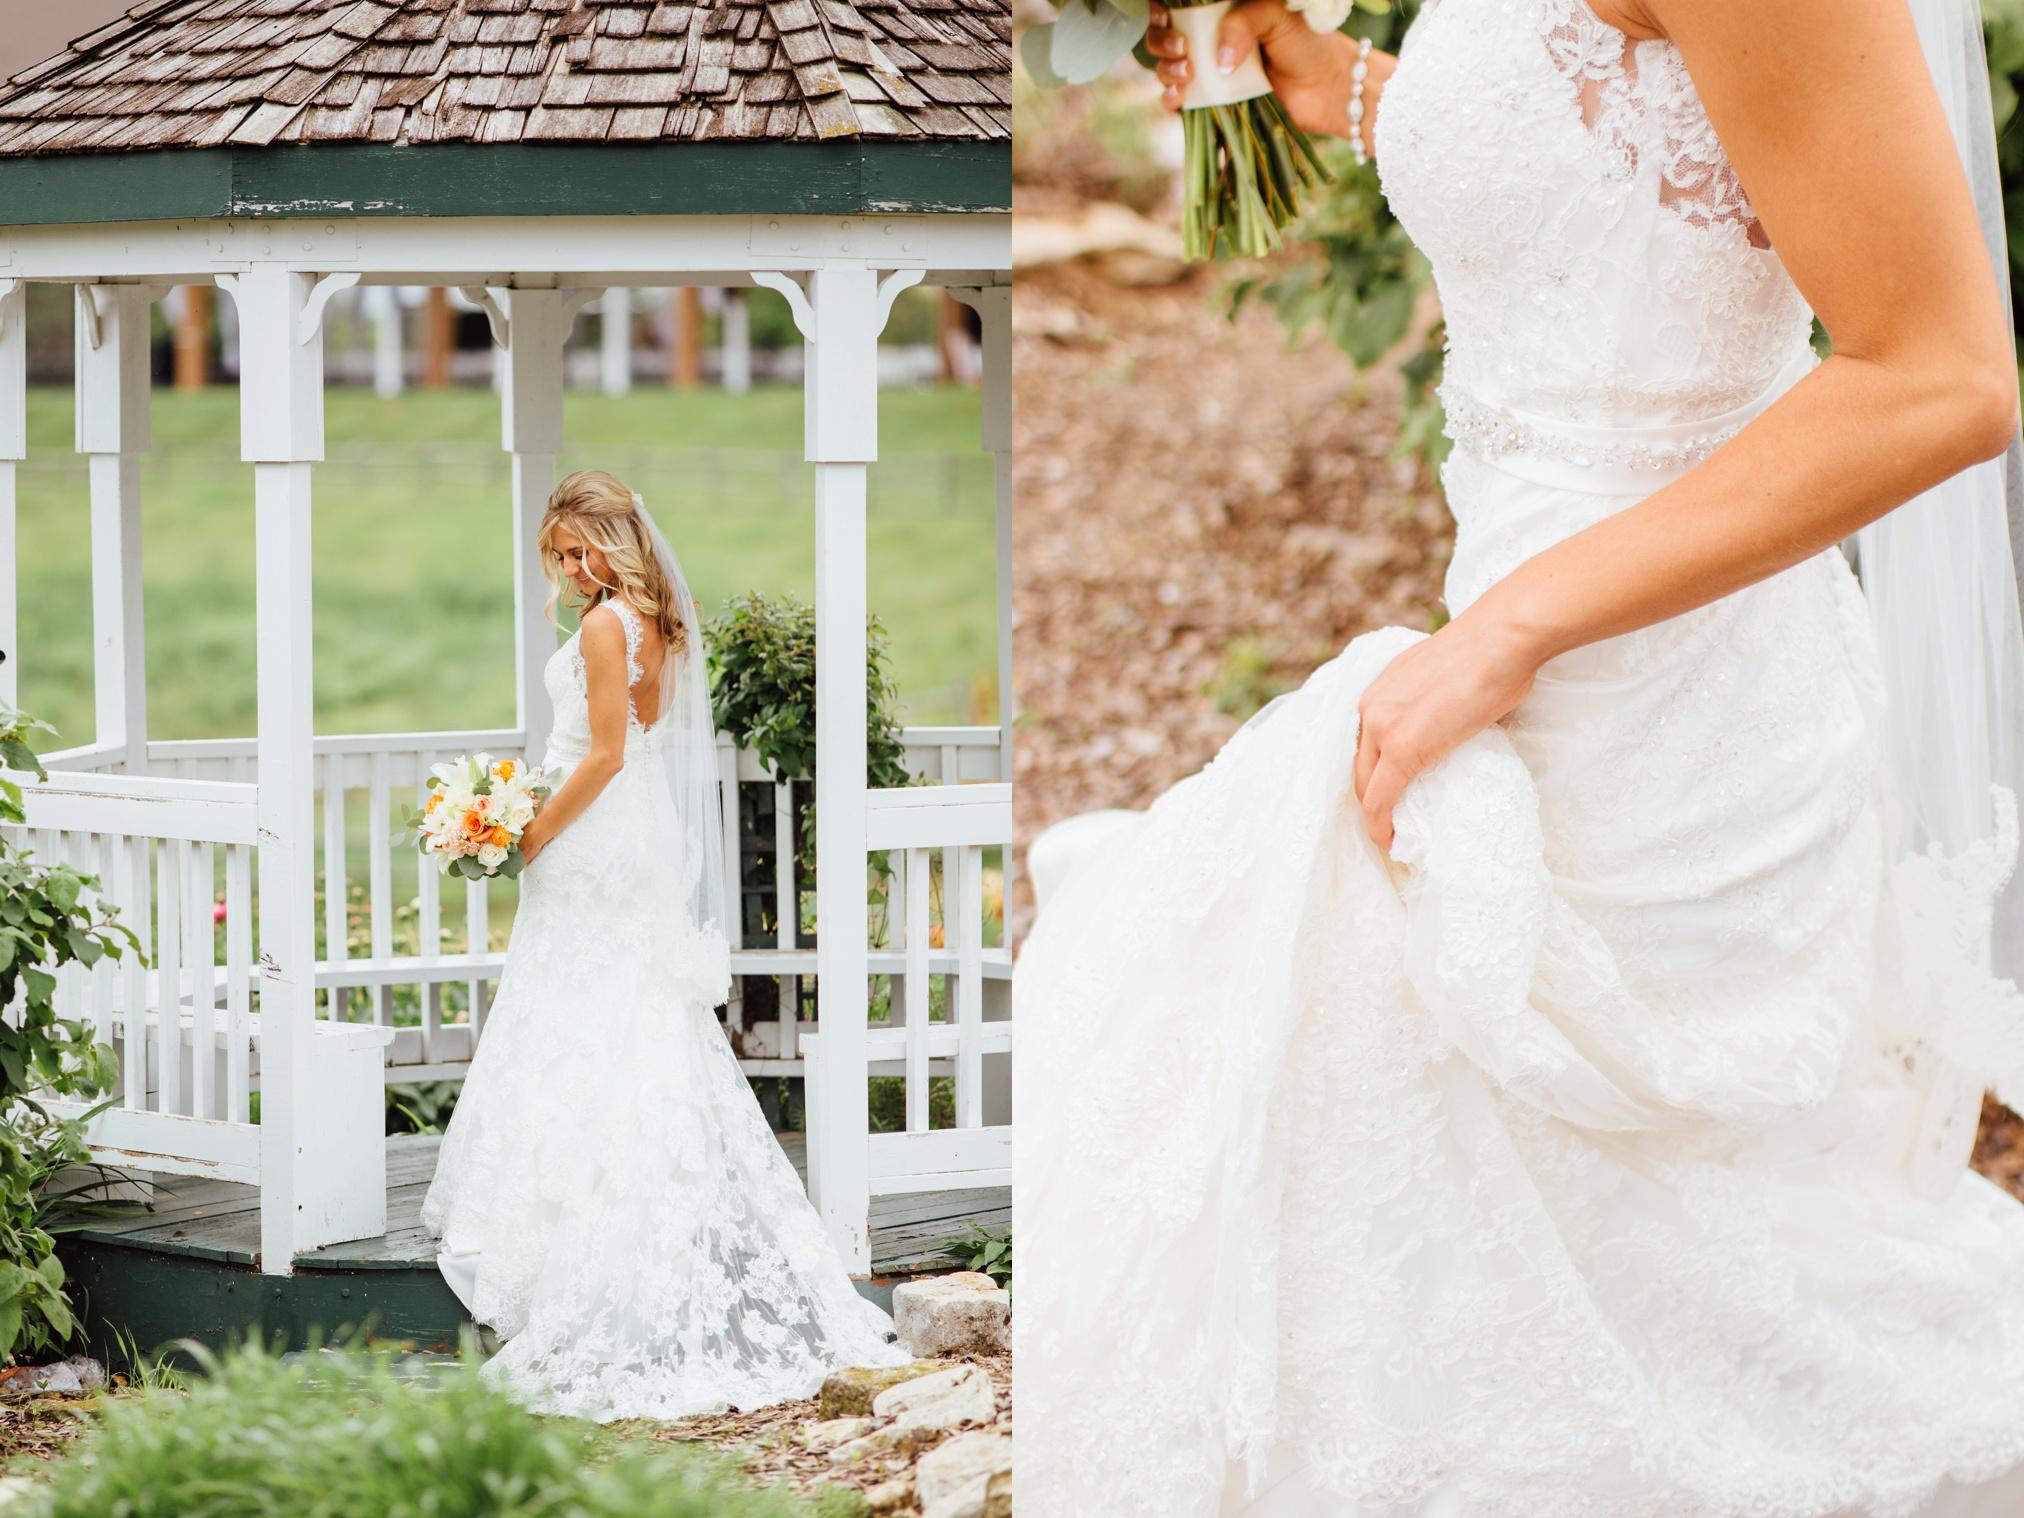 schmid_wedding-115.jpg